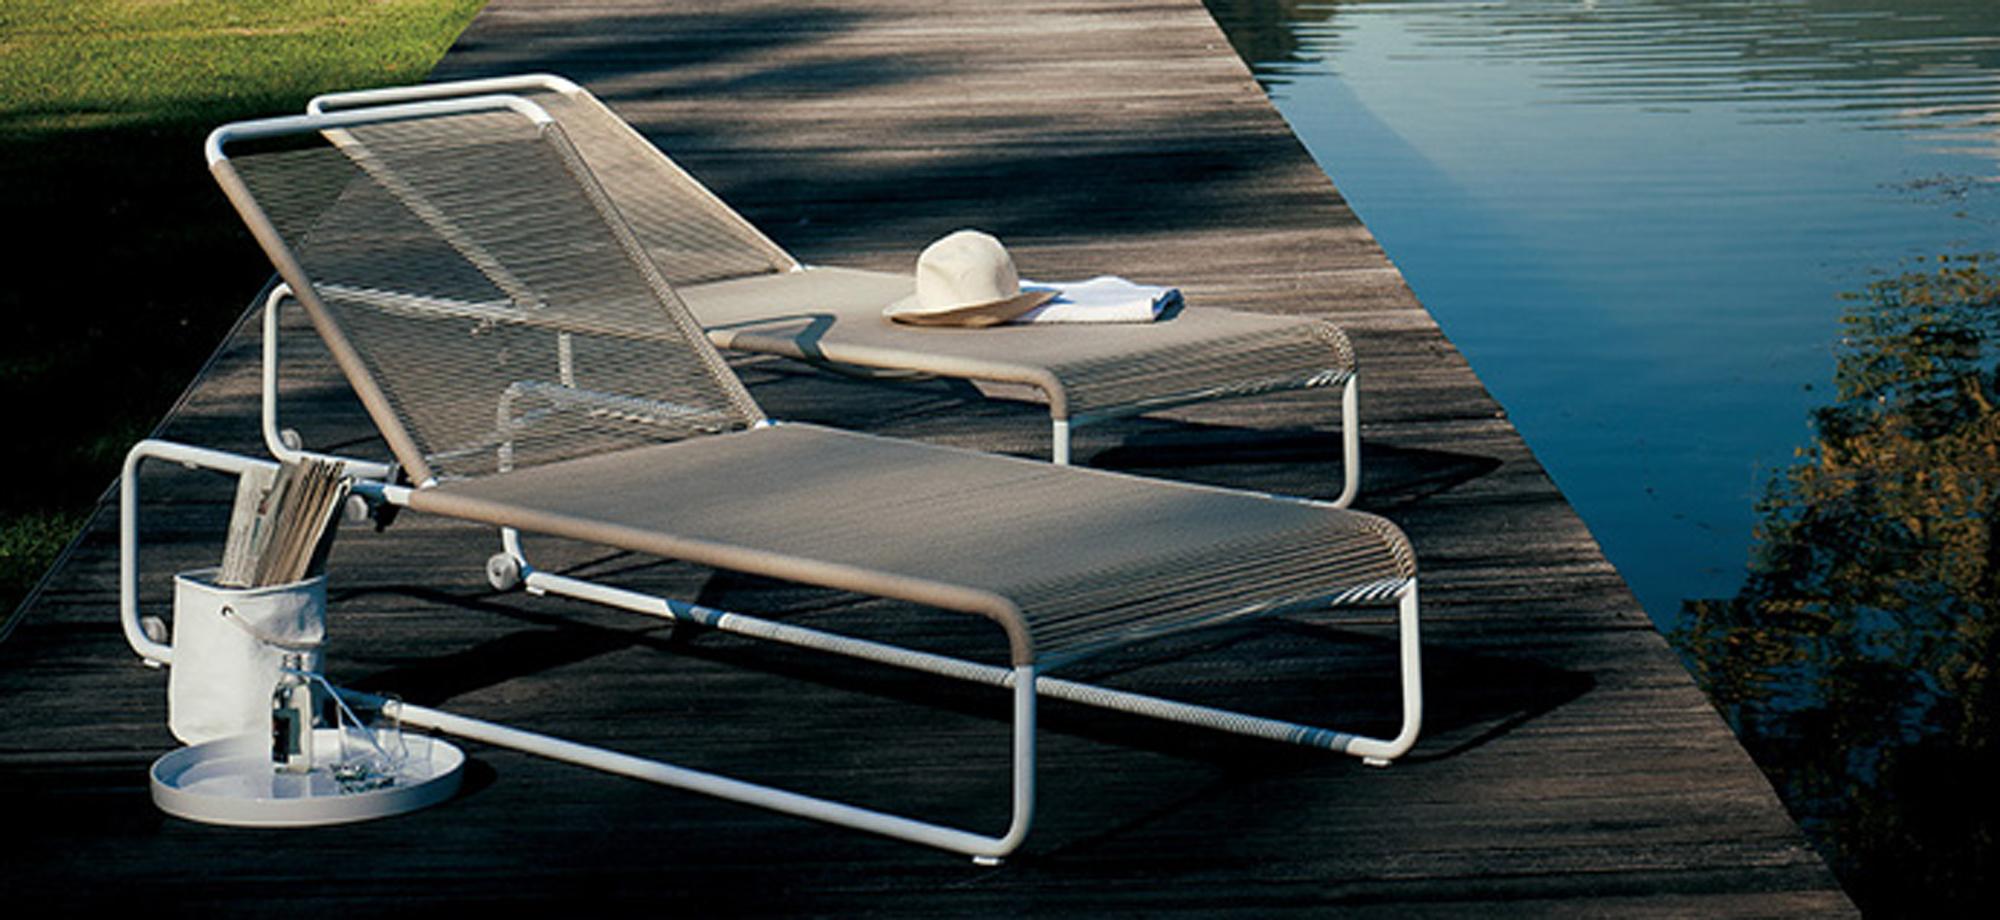 Arredi outdoor cavaliere mobili for Outdoor mobili